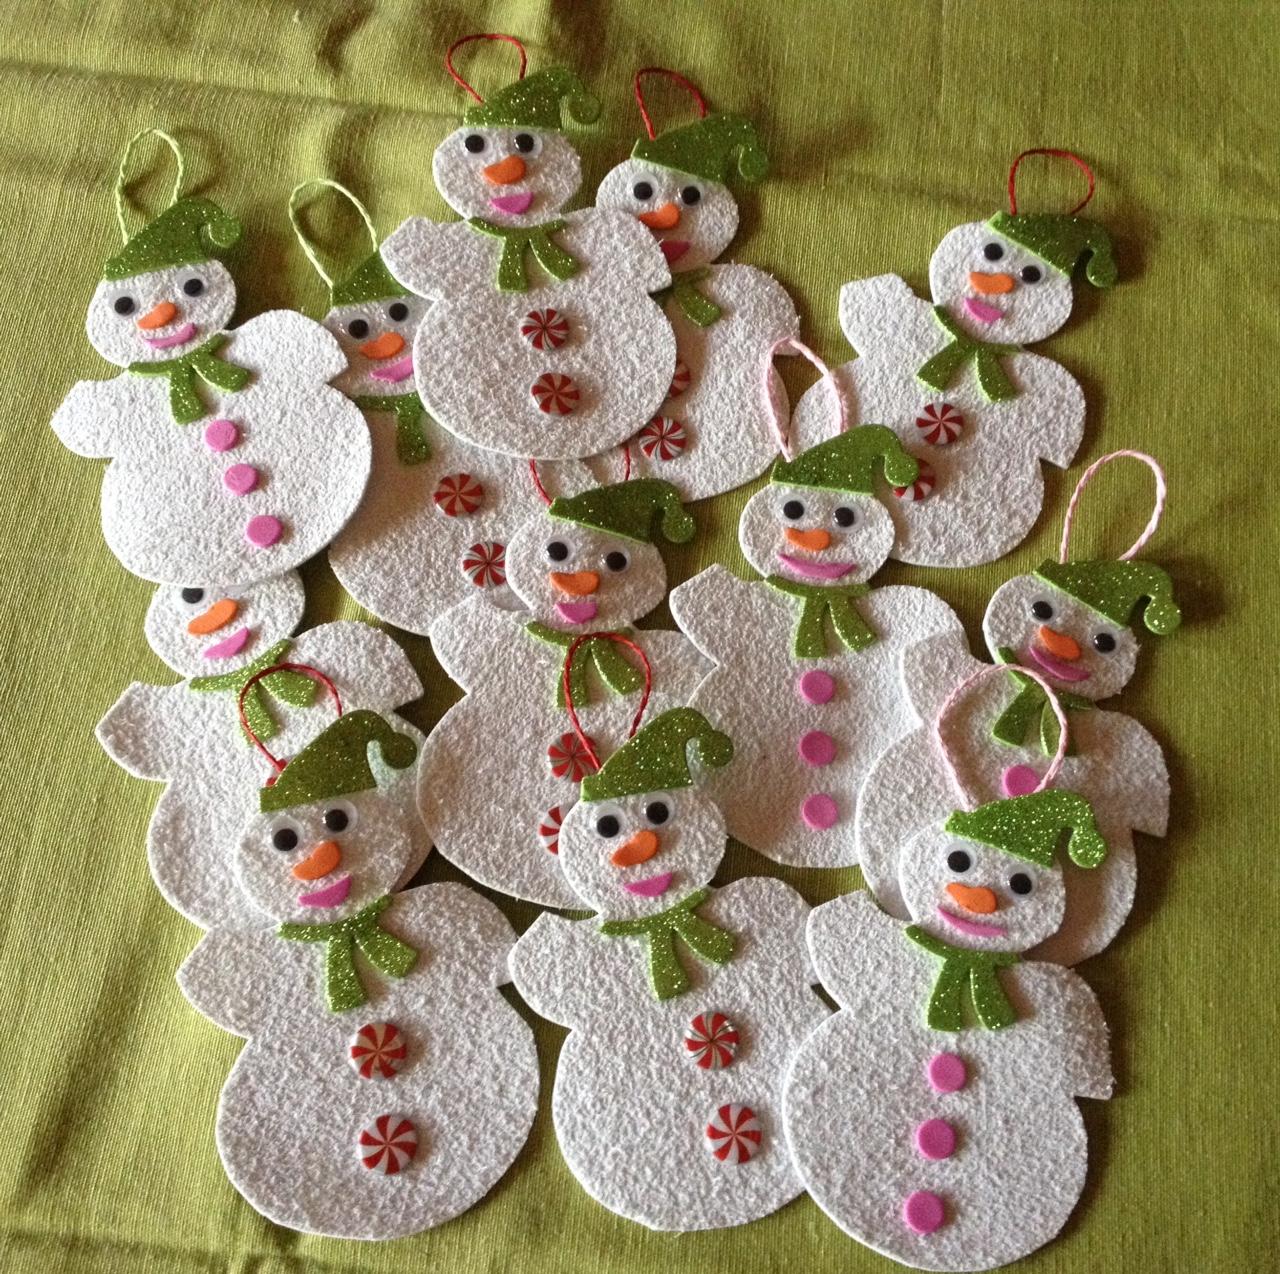 Decorazioni natalizie di gommapiuma kevitafarelamamma - Decorazioni natalizie ...